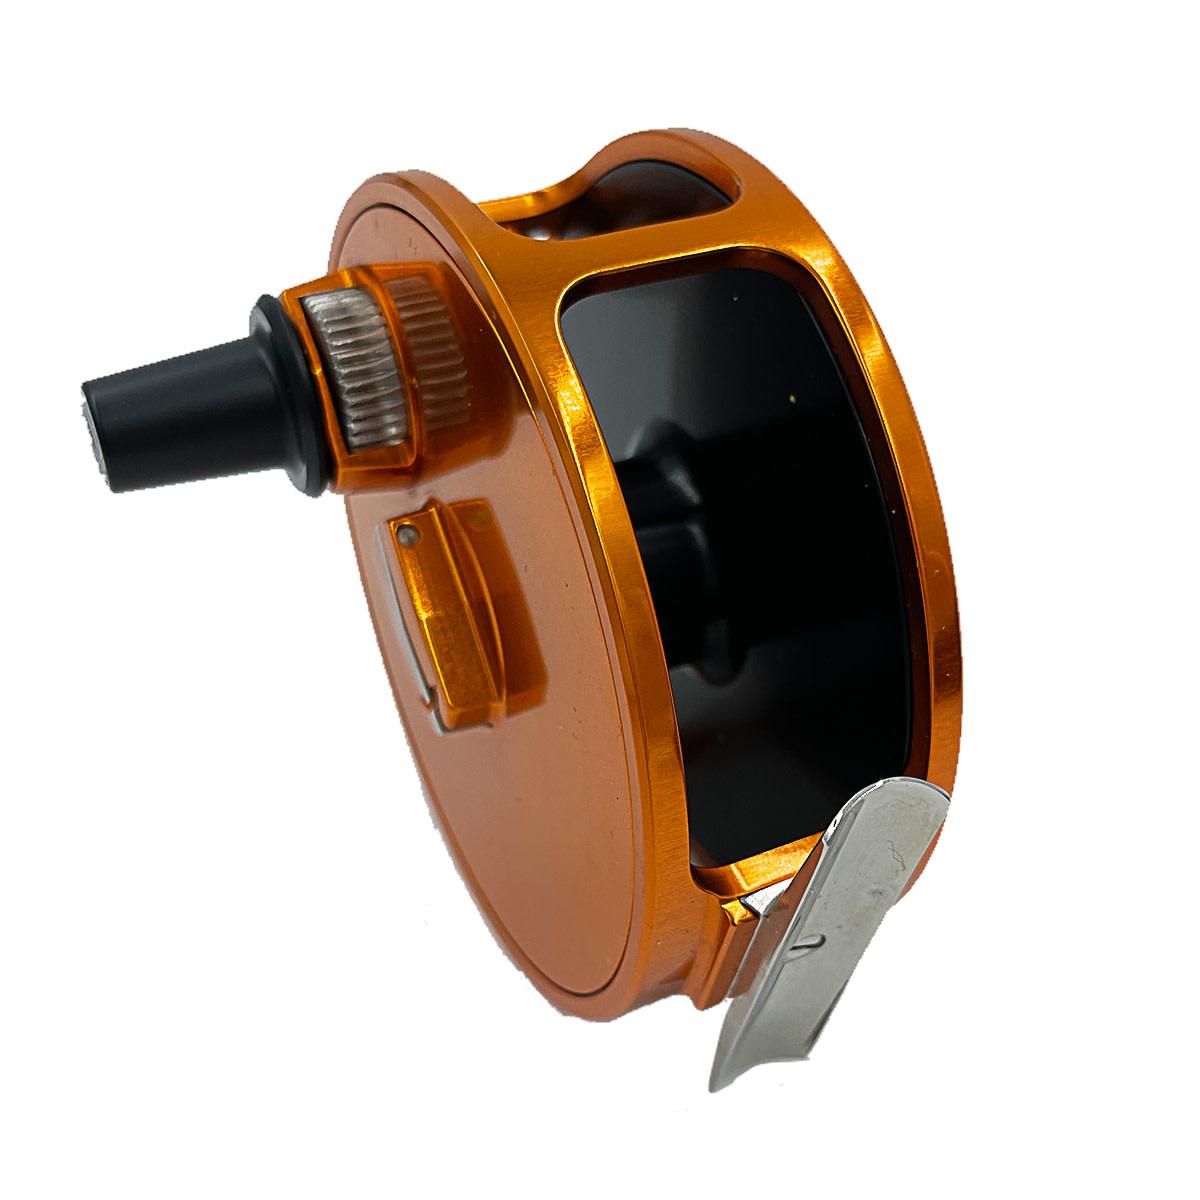 A.P.I. (Angling Products Inc.) A.P.I. Sea Run Orange Reel (RHW)